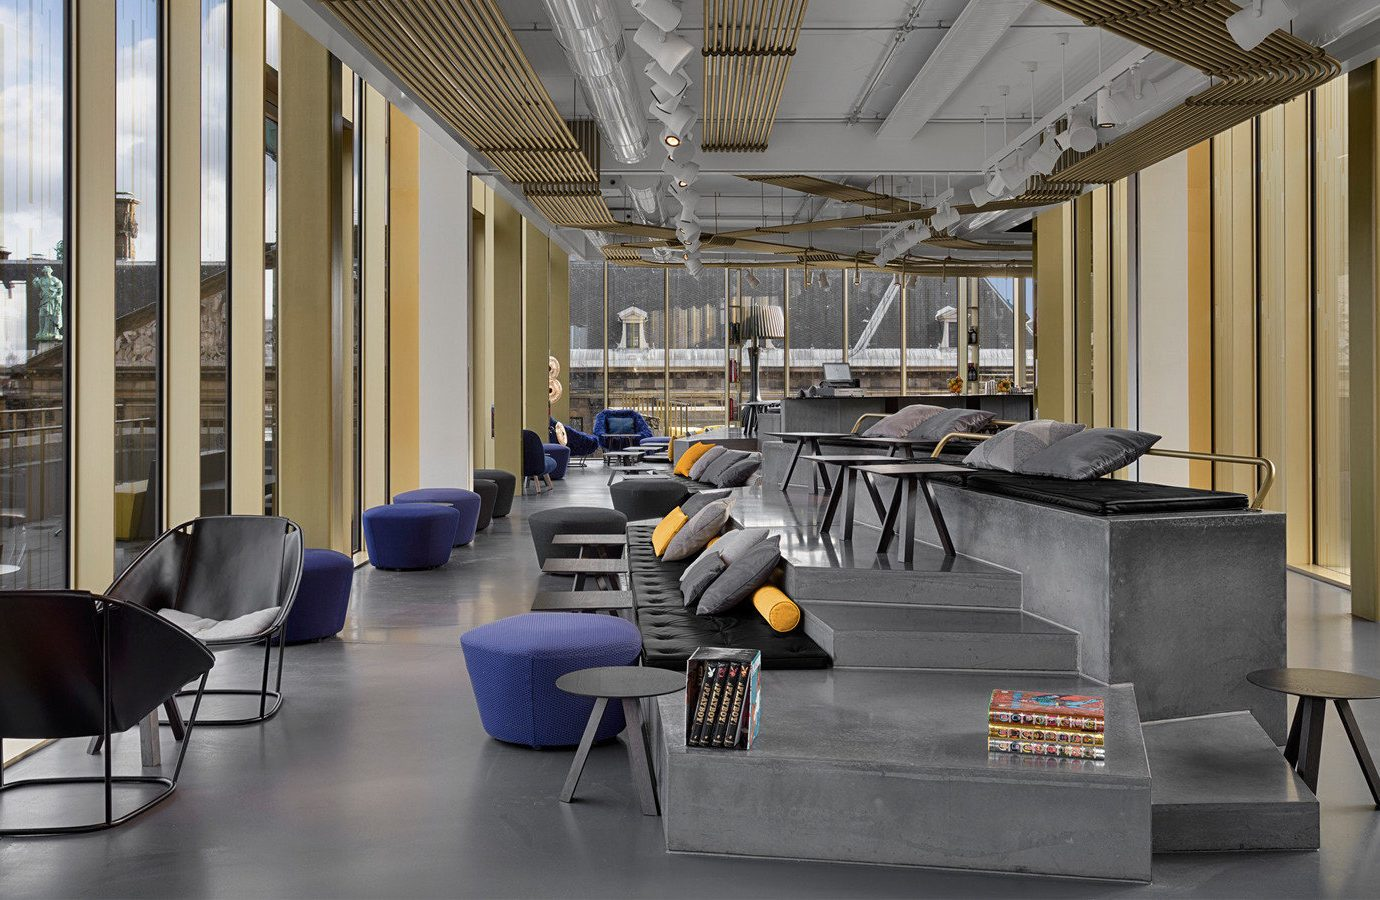 Amsterdam Hotels The Netherlands Architecture furniture interior design Lobby